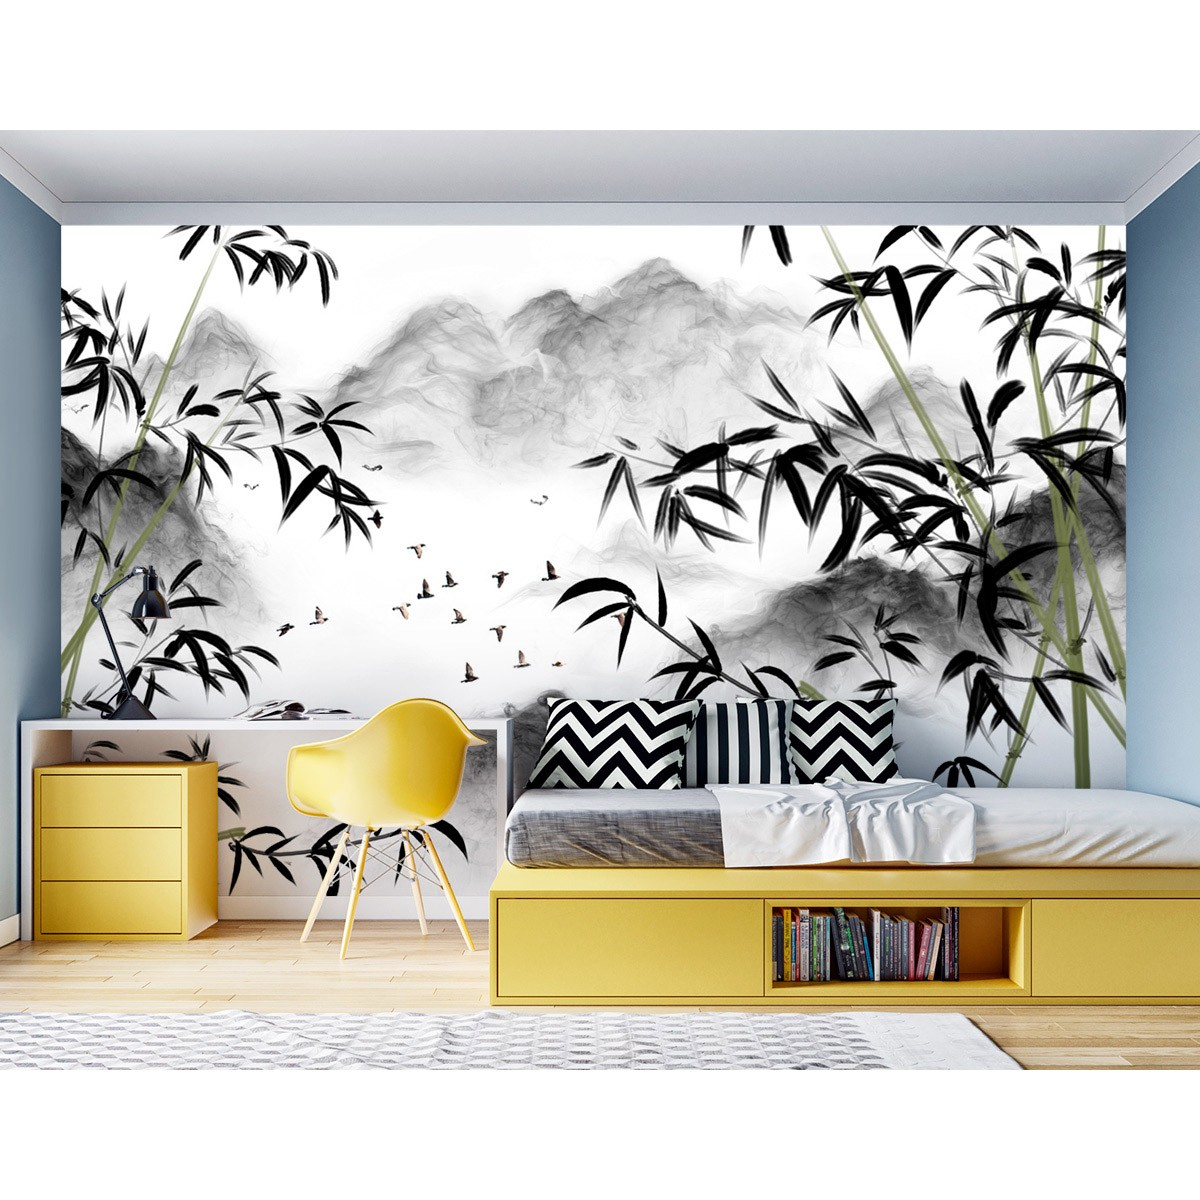 Painel Adesivo - Montanhas e bambus